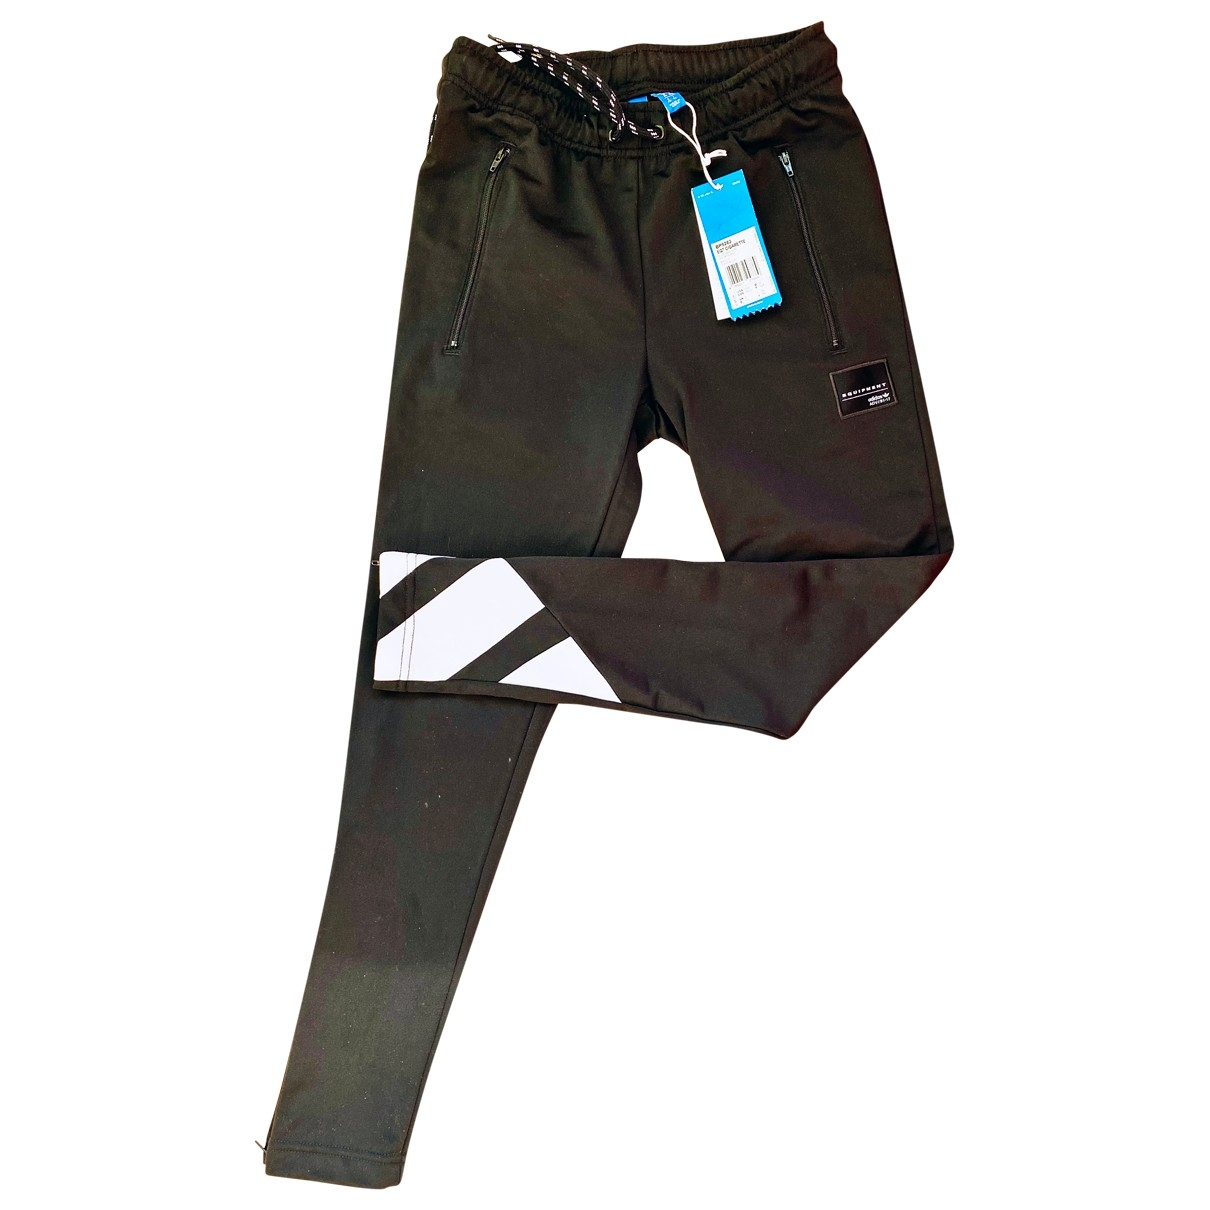 Adidas \N Hose in  Schwarz Polyester